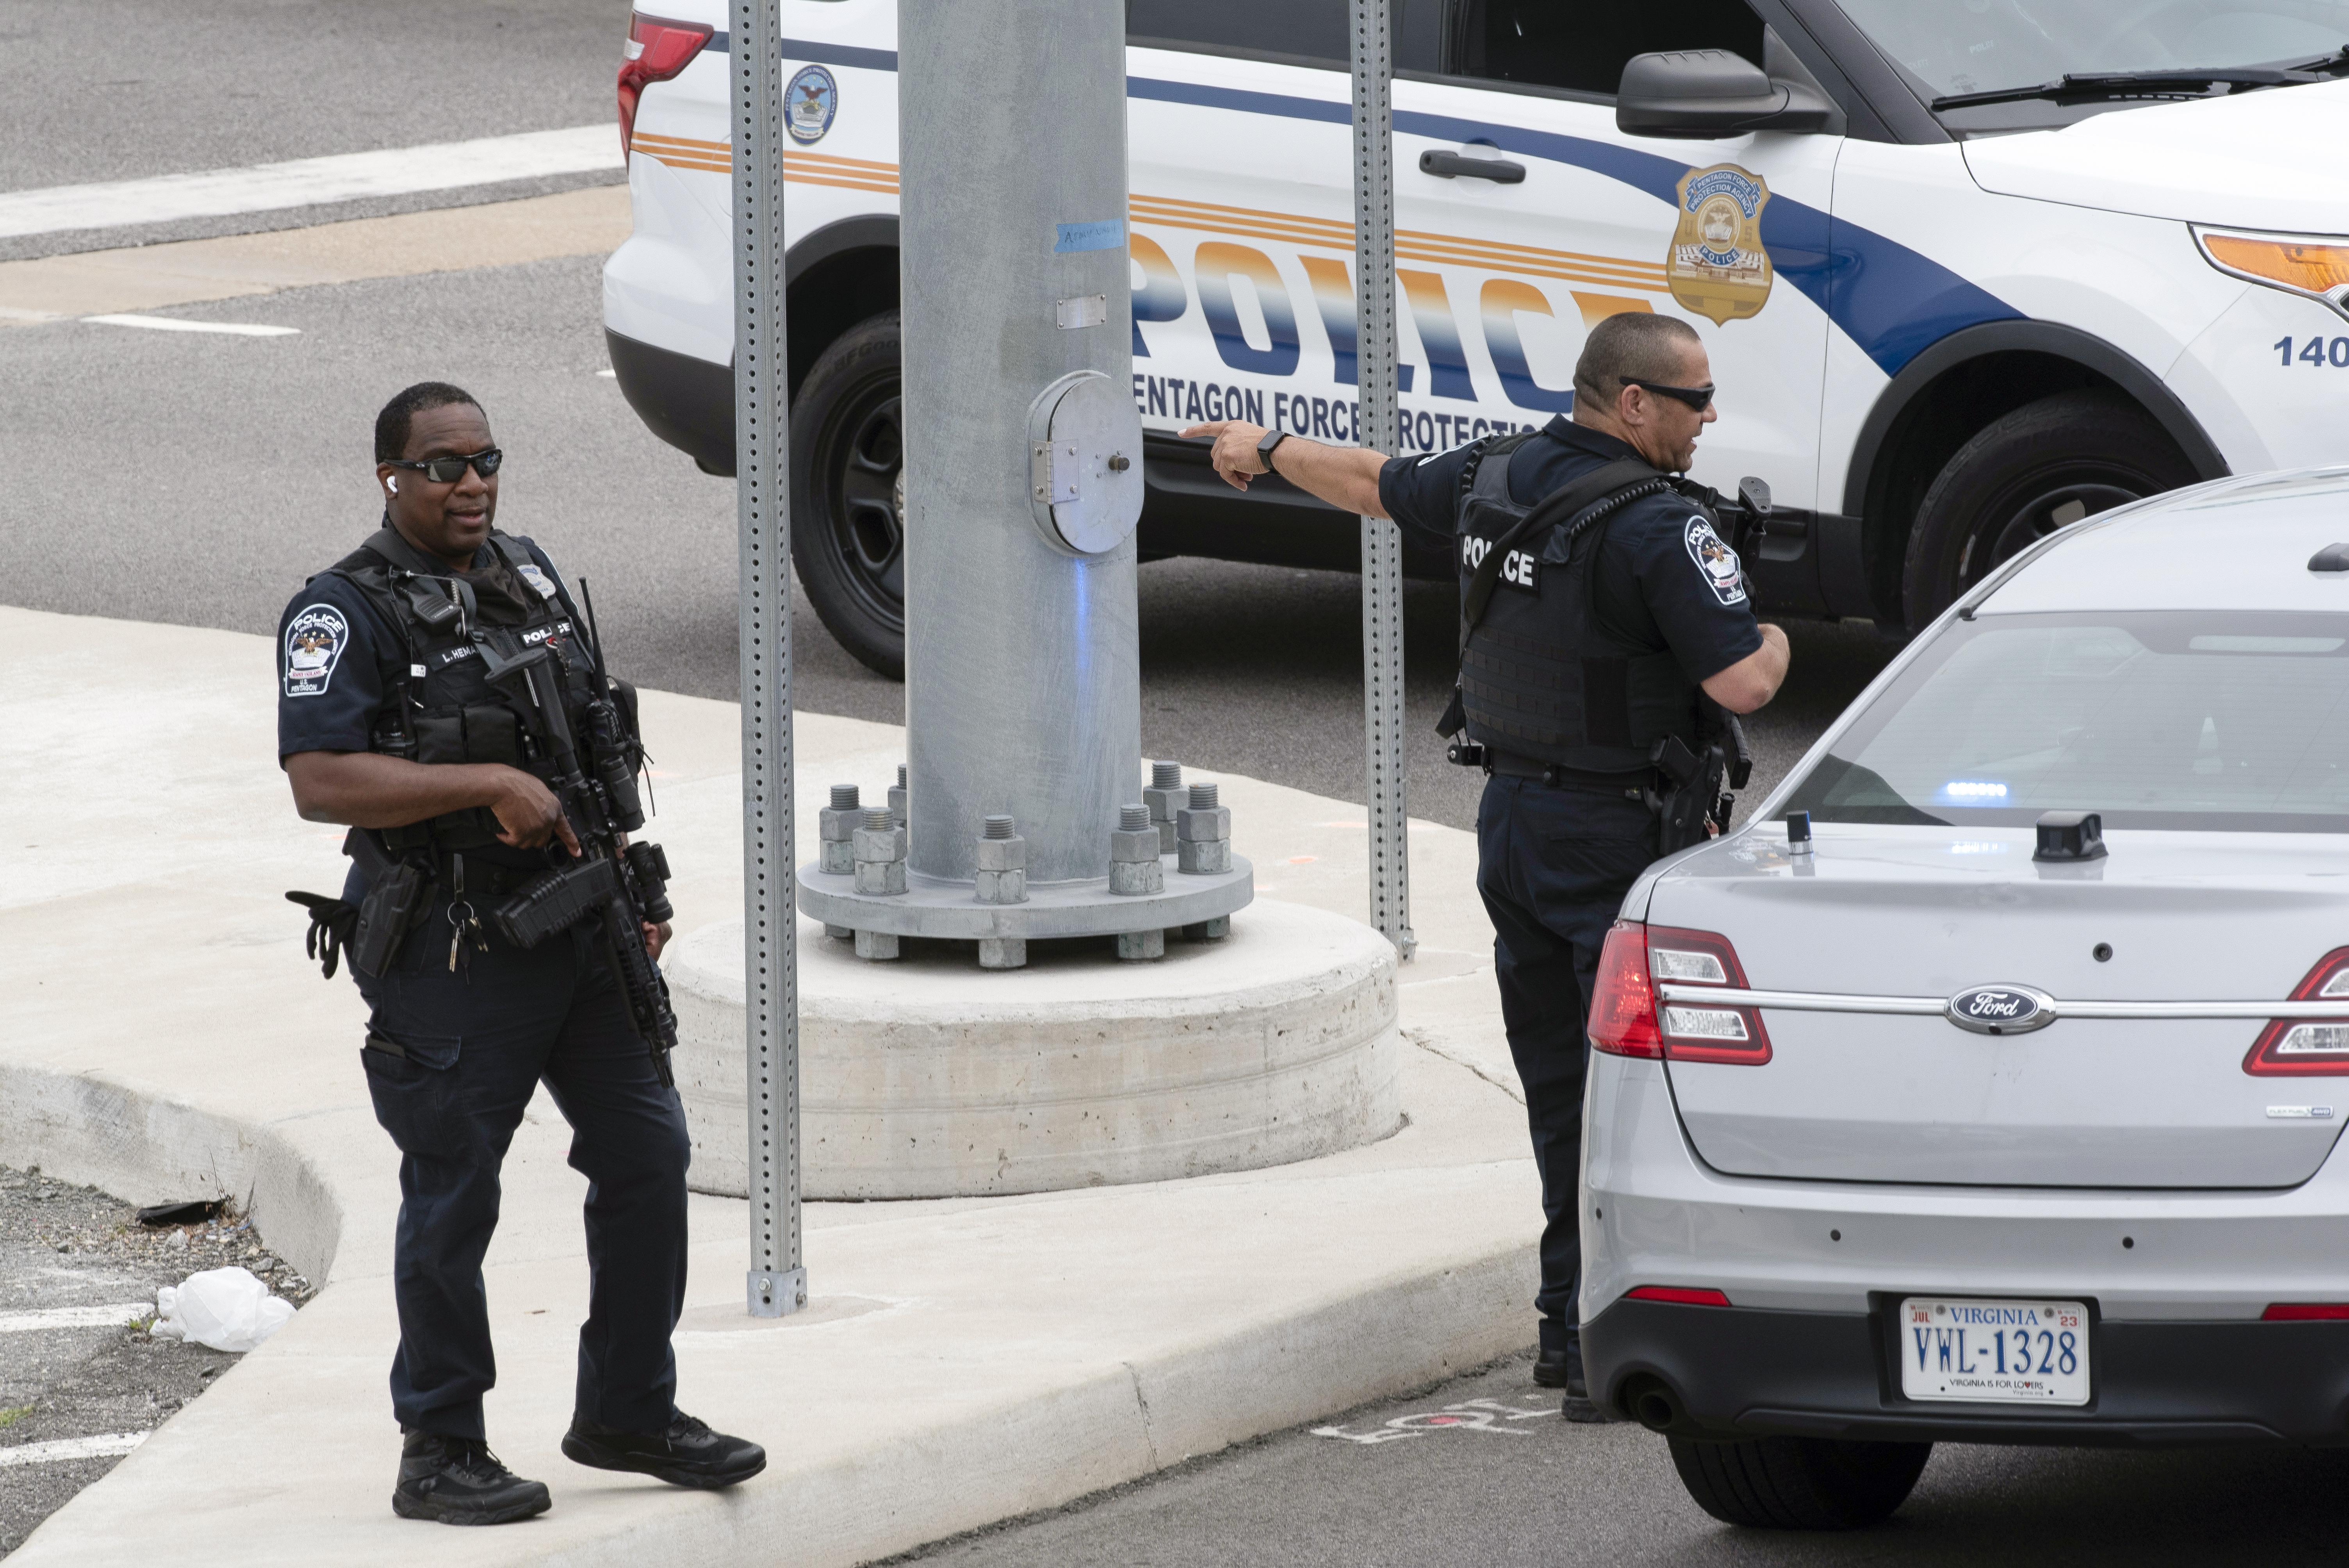 <p>Затвориха Пентагона заради стрелба до метростанция</p>